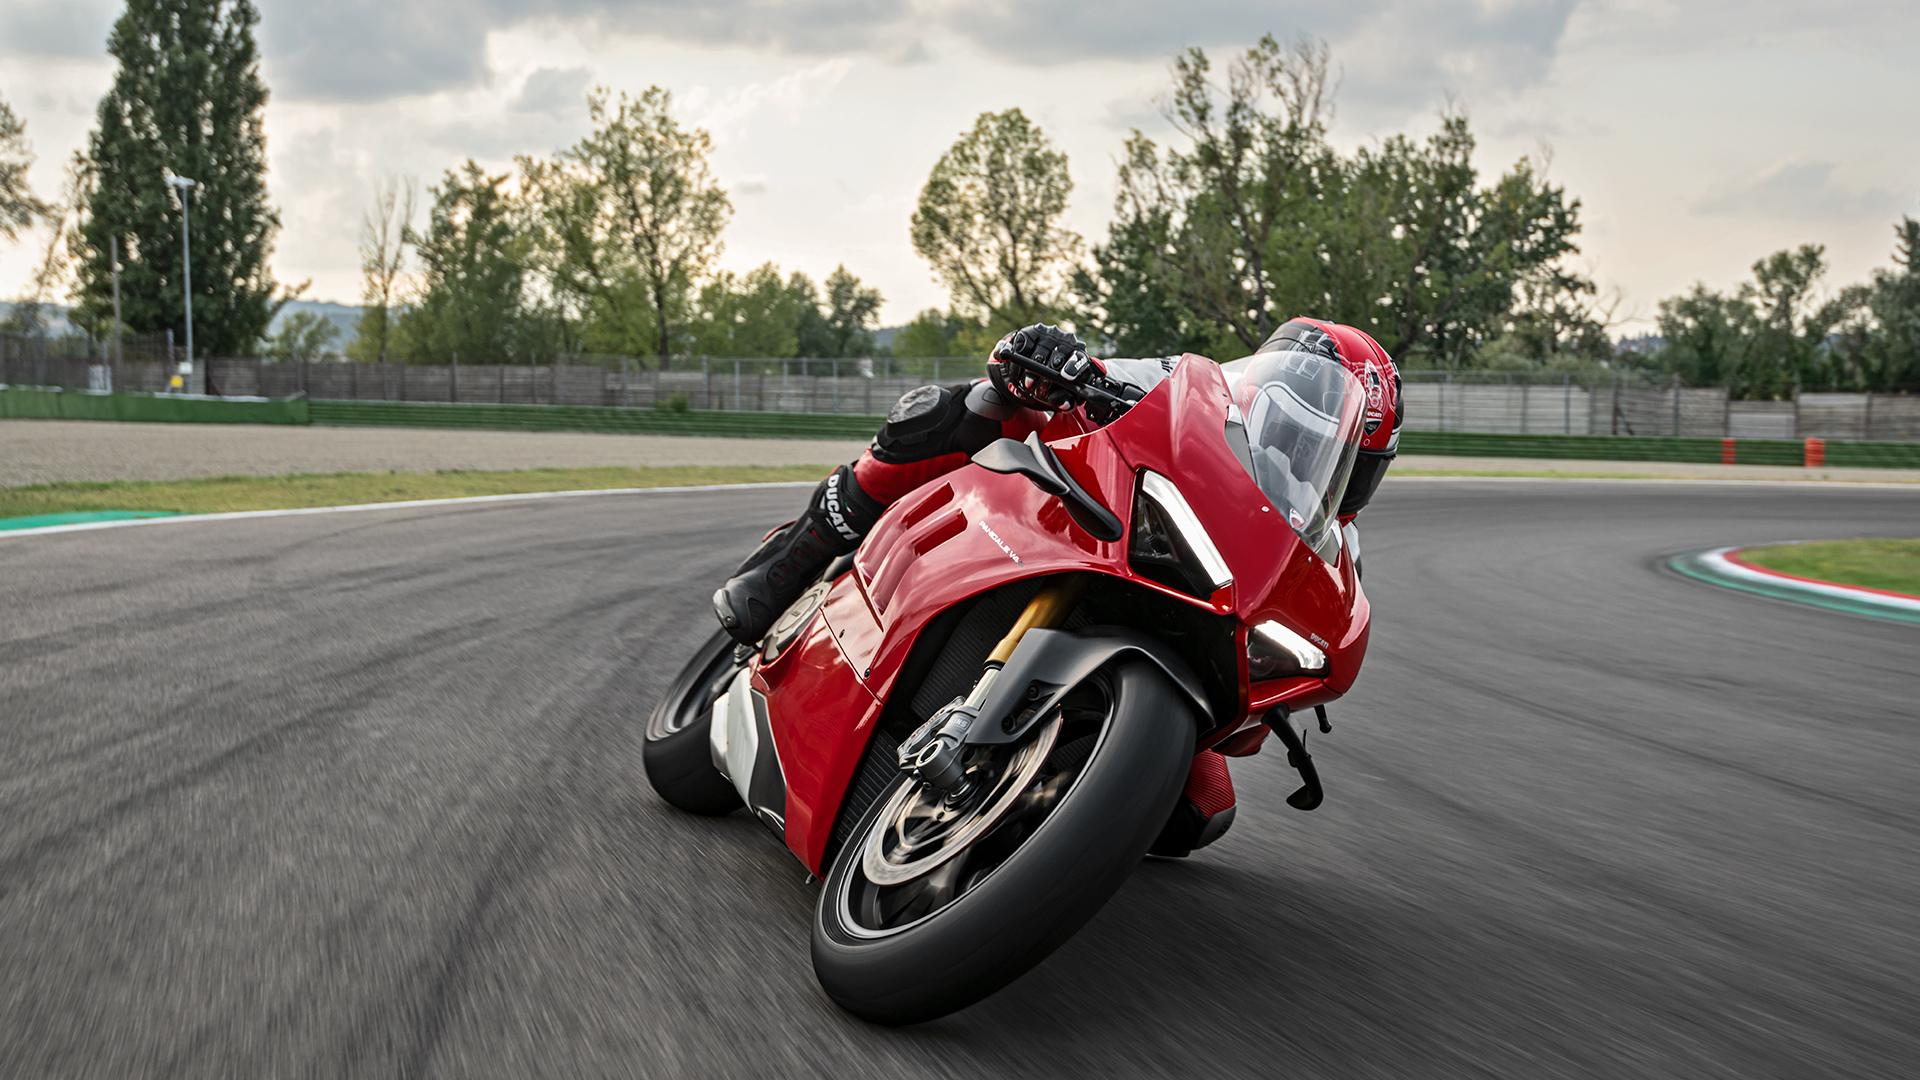 La Ducati Panigale V4 disponible comme location de moto